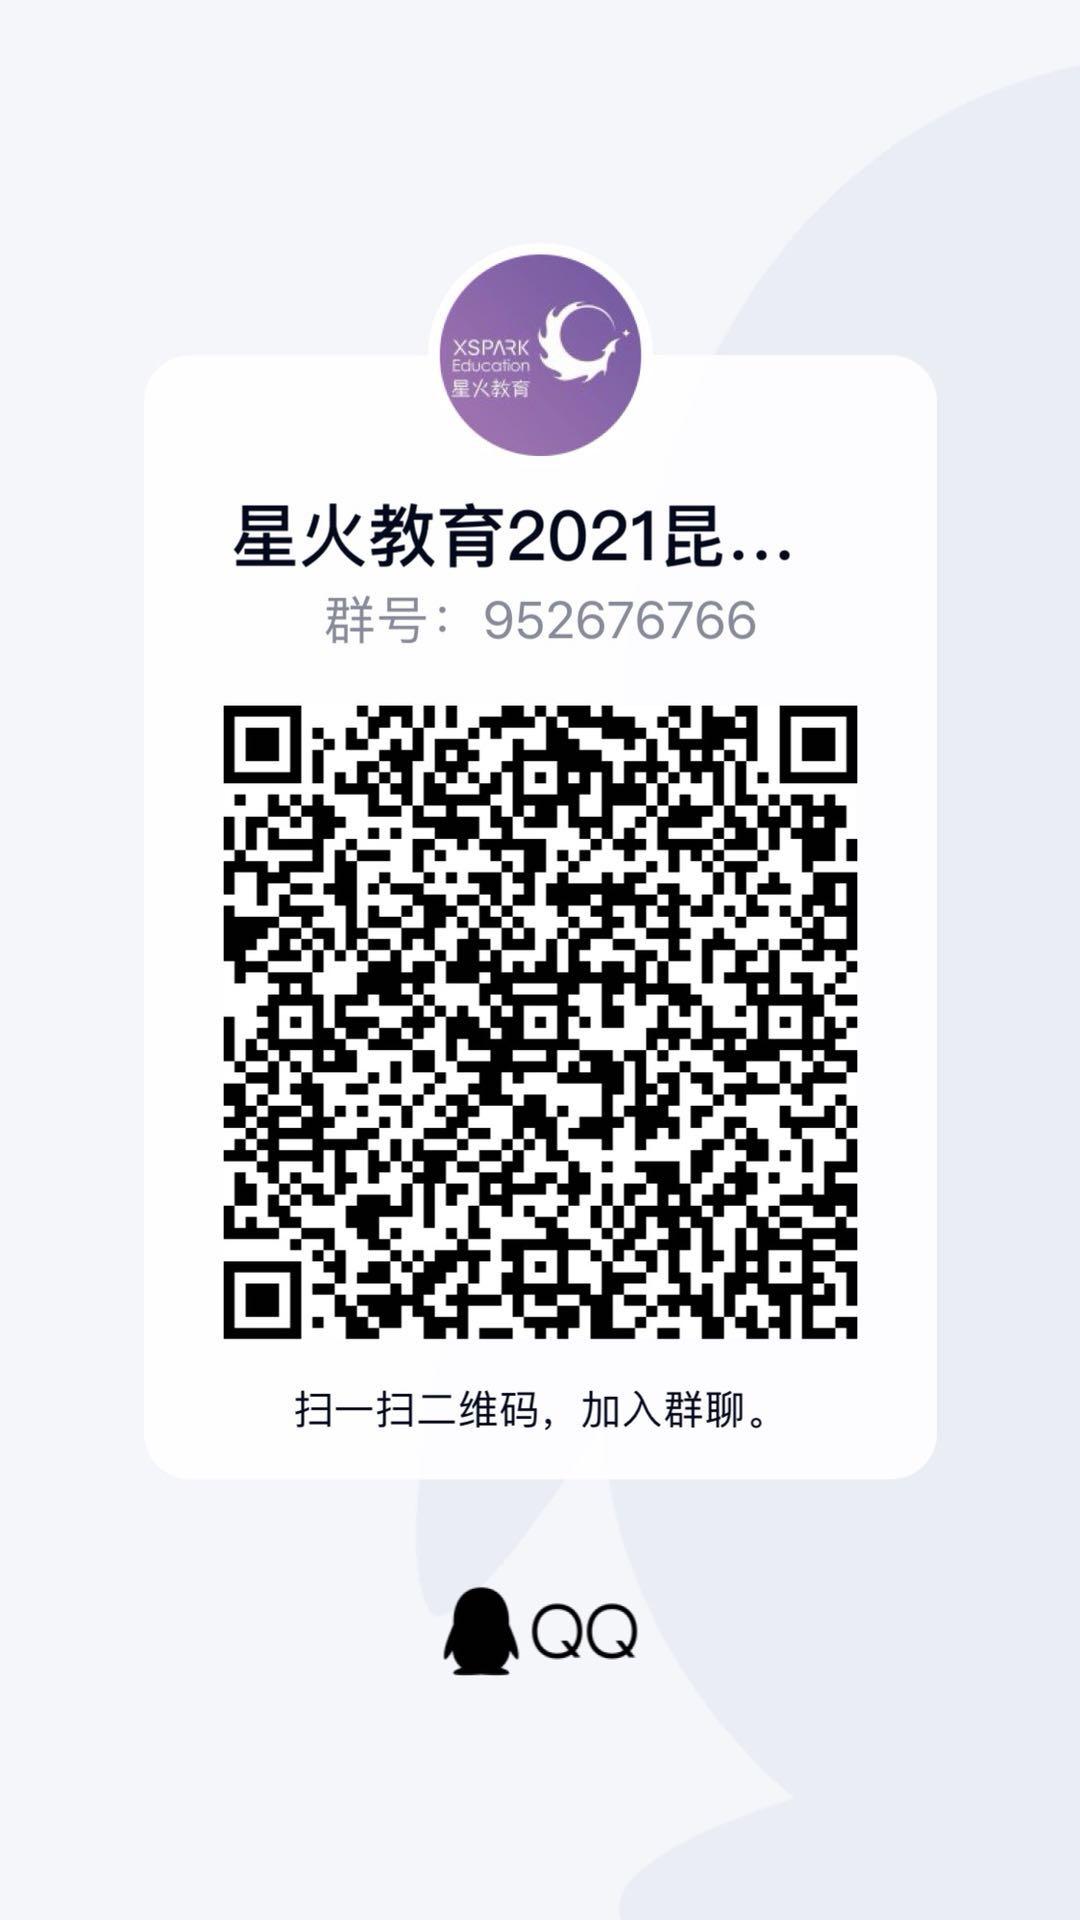 0ccddc0b-a566-4260-95ae-c86bcc1debb0.jpg